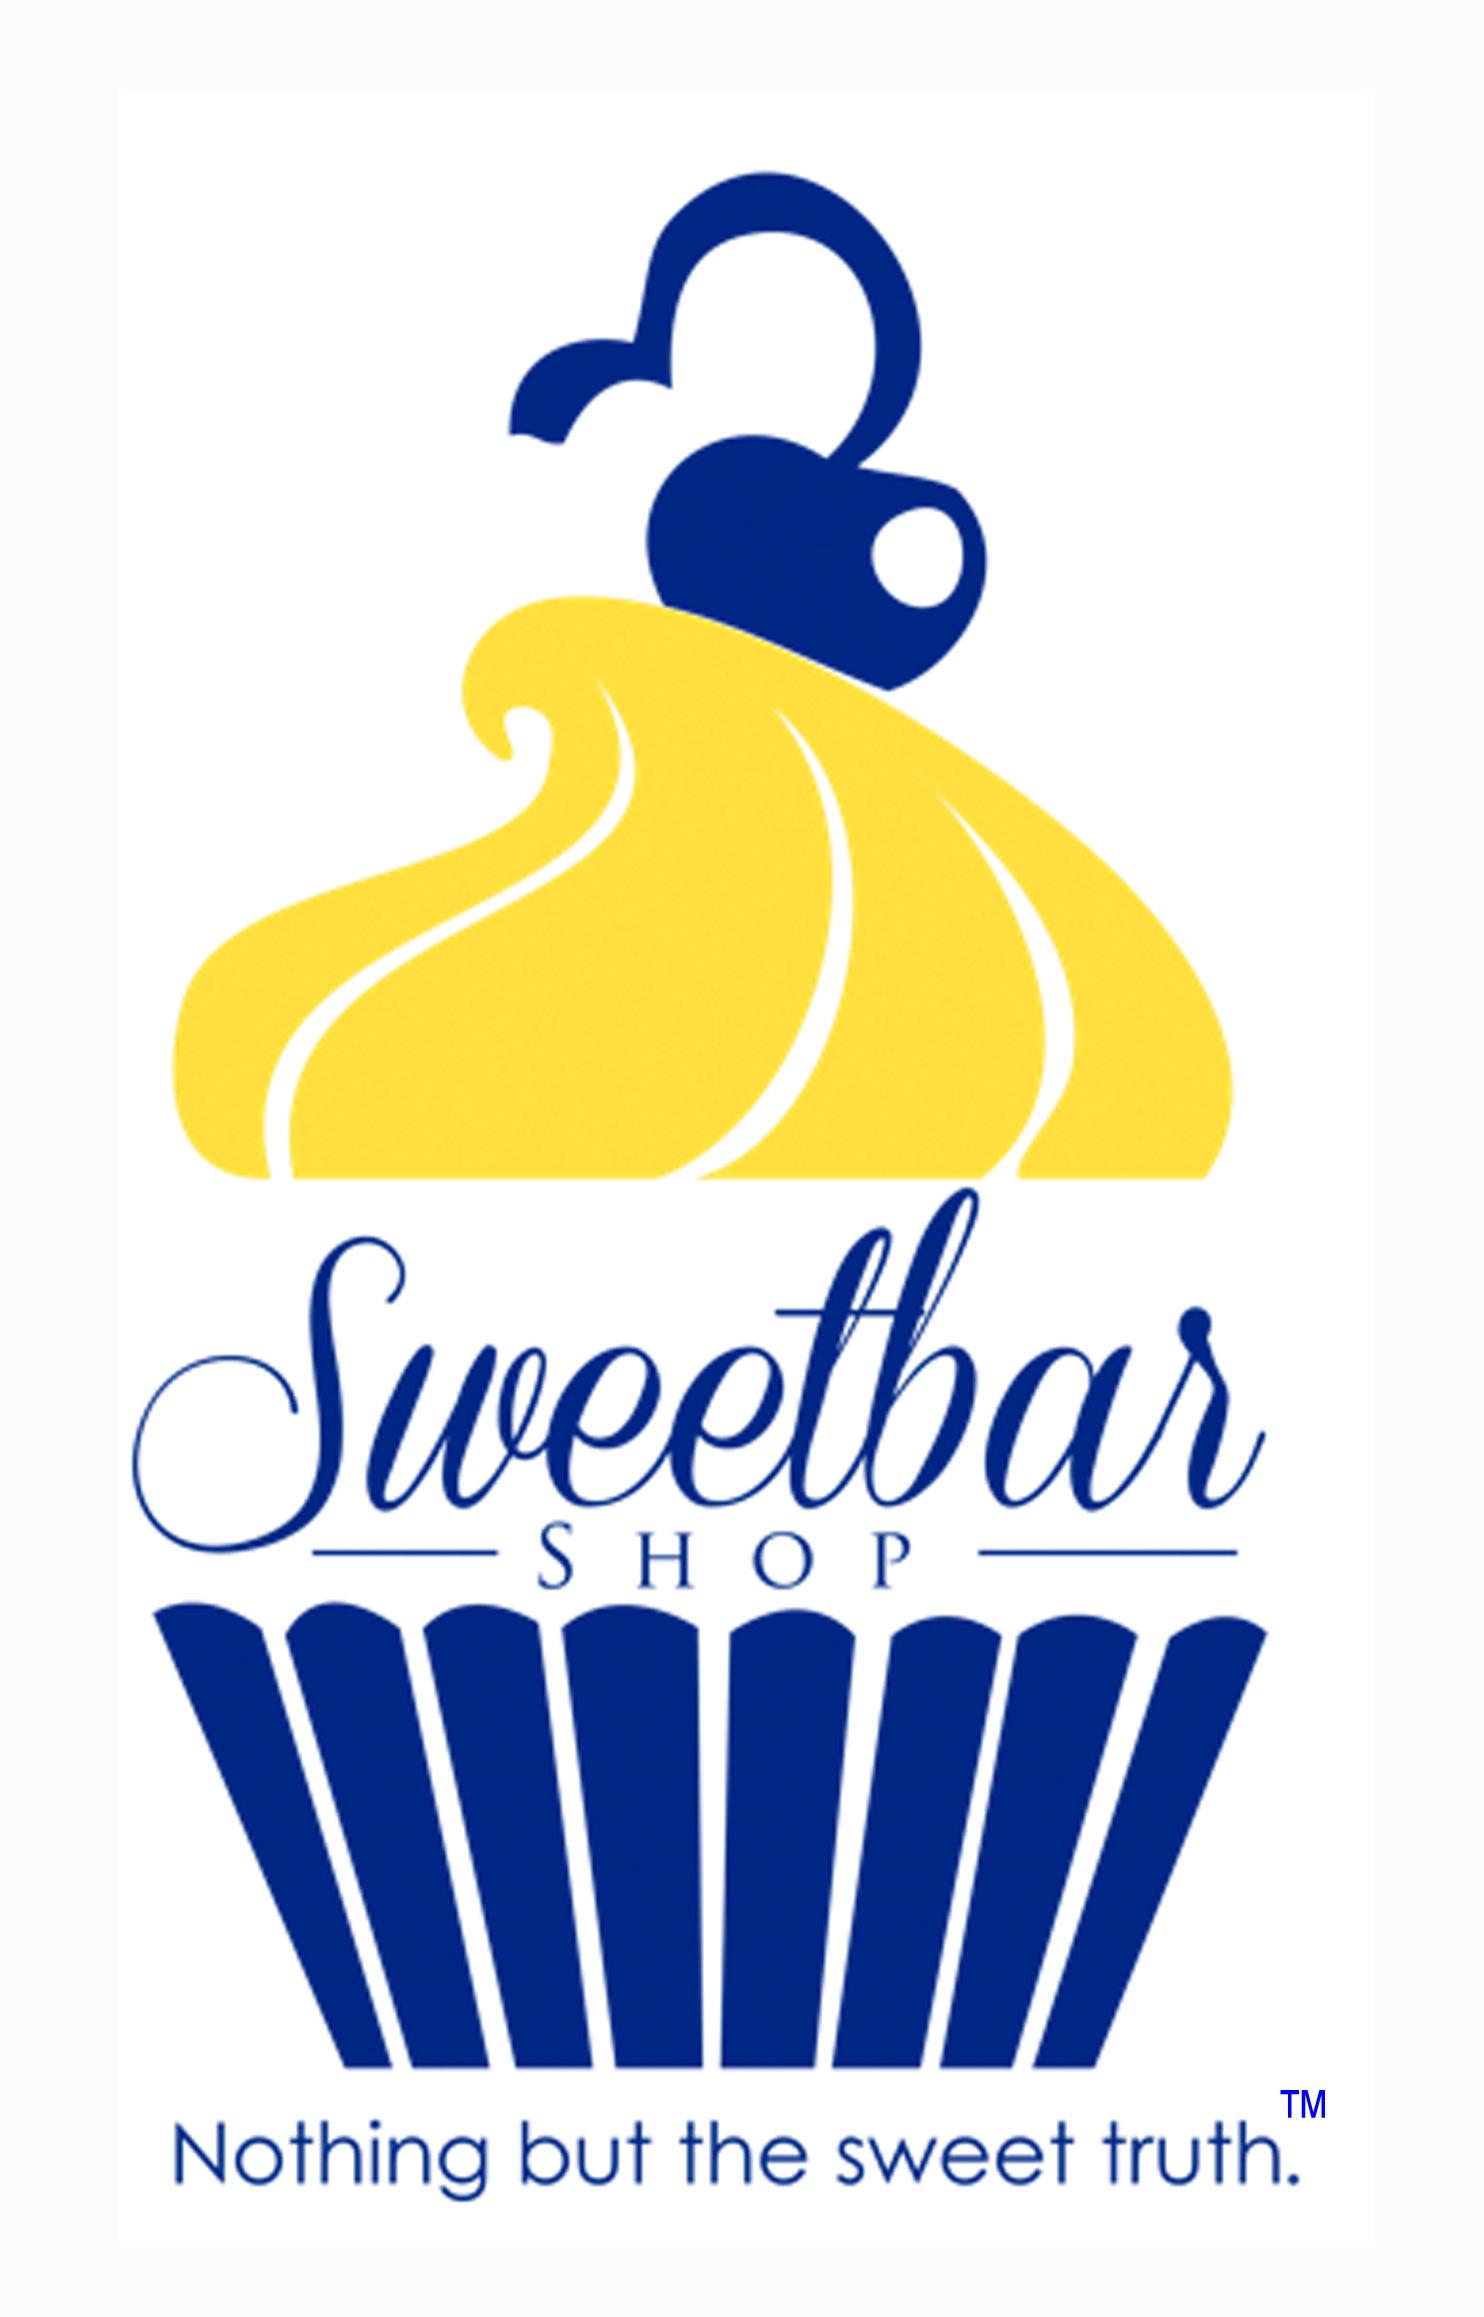 Sweetbar Shop, LLC Logo